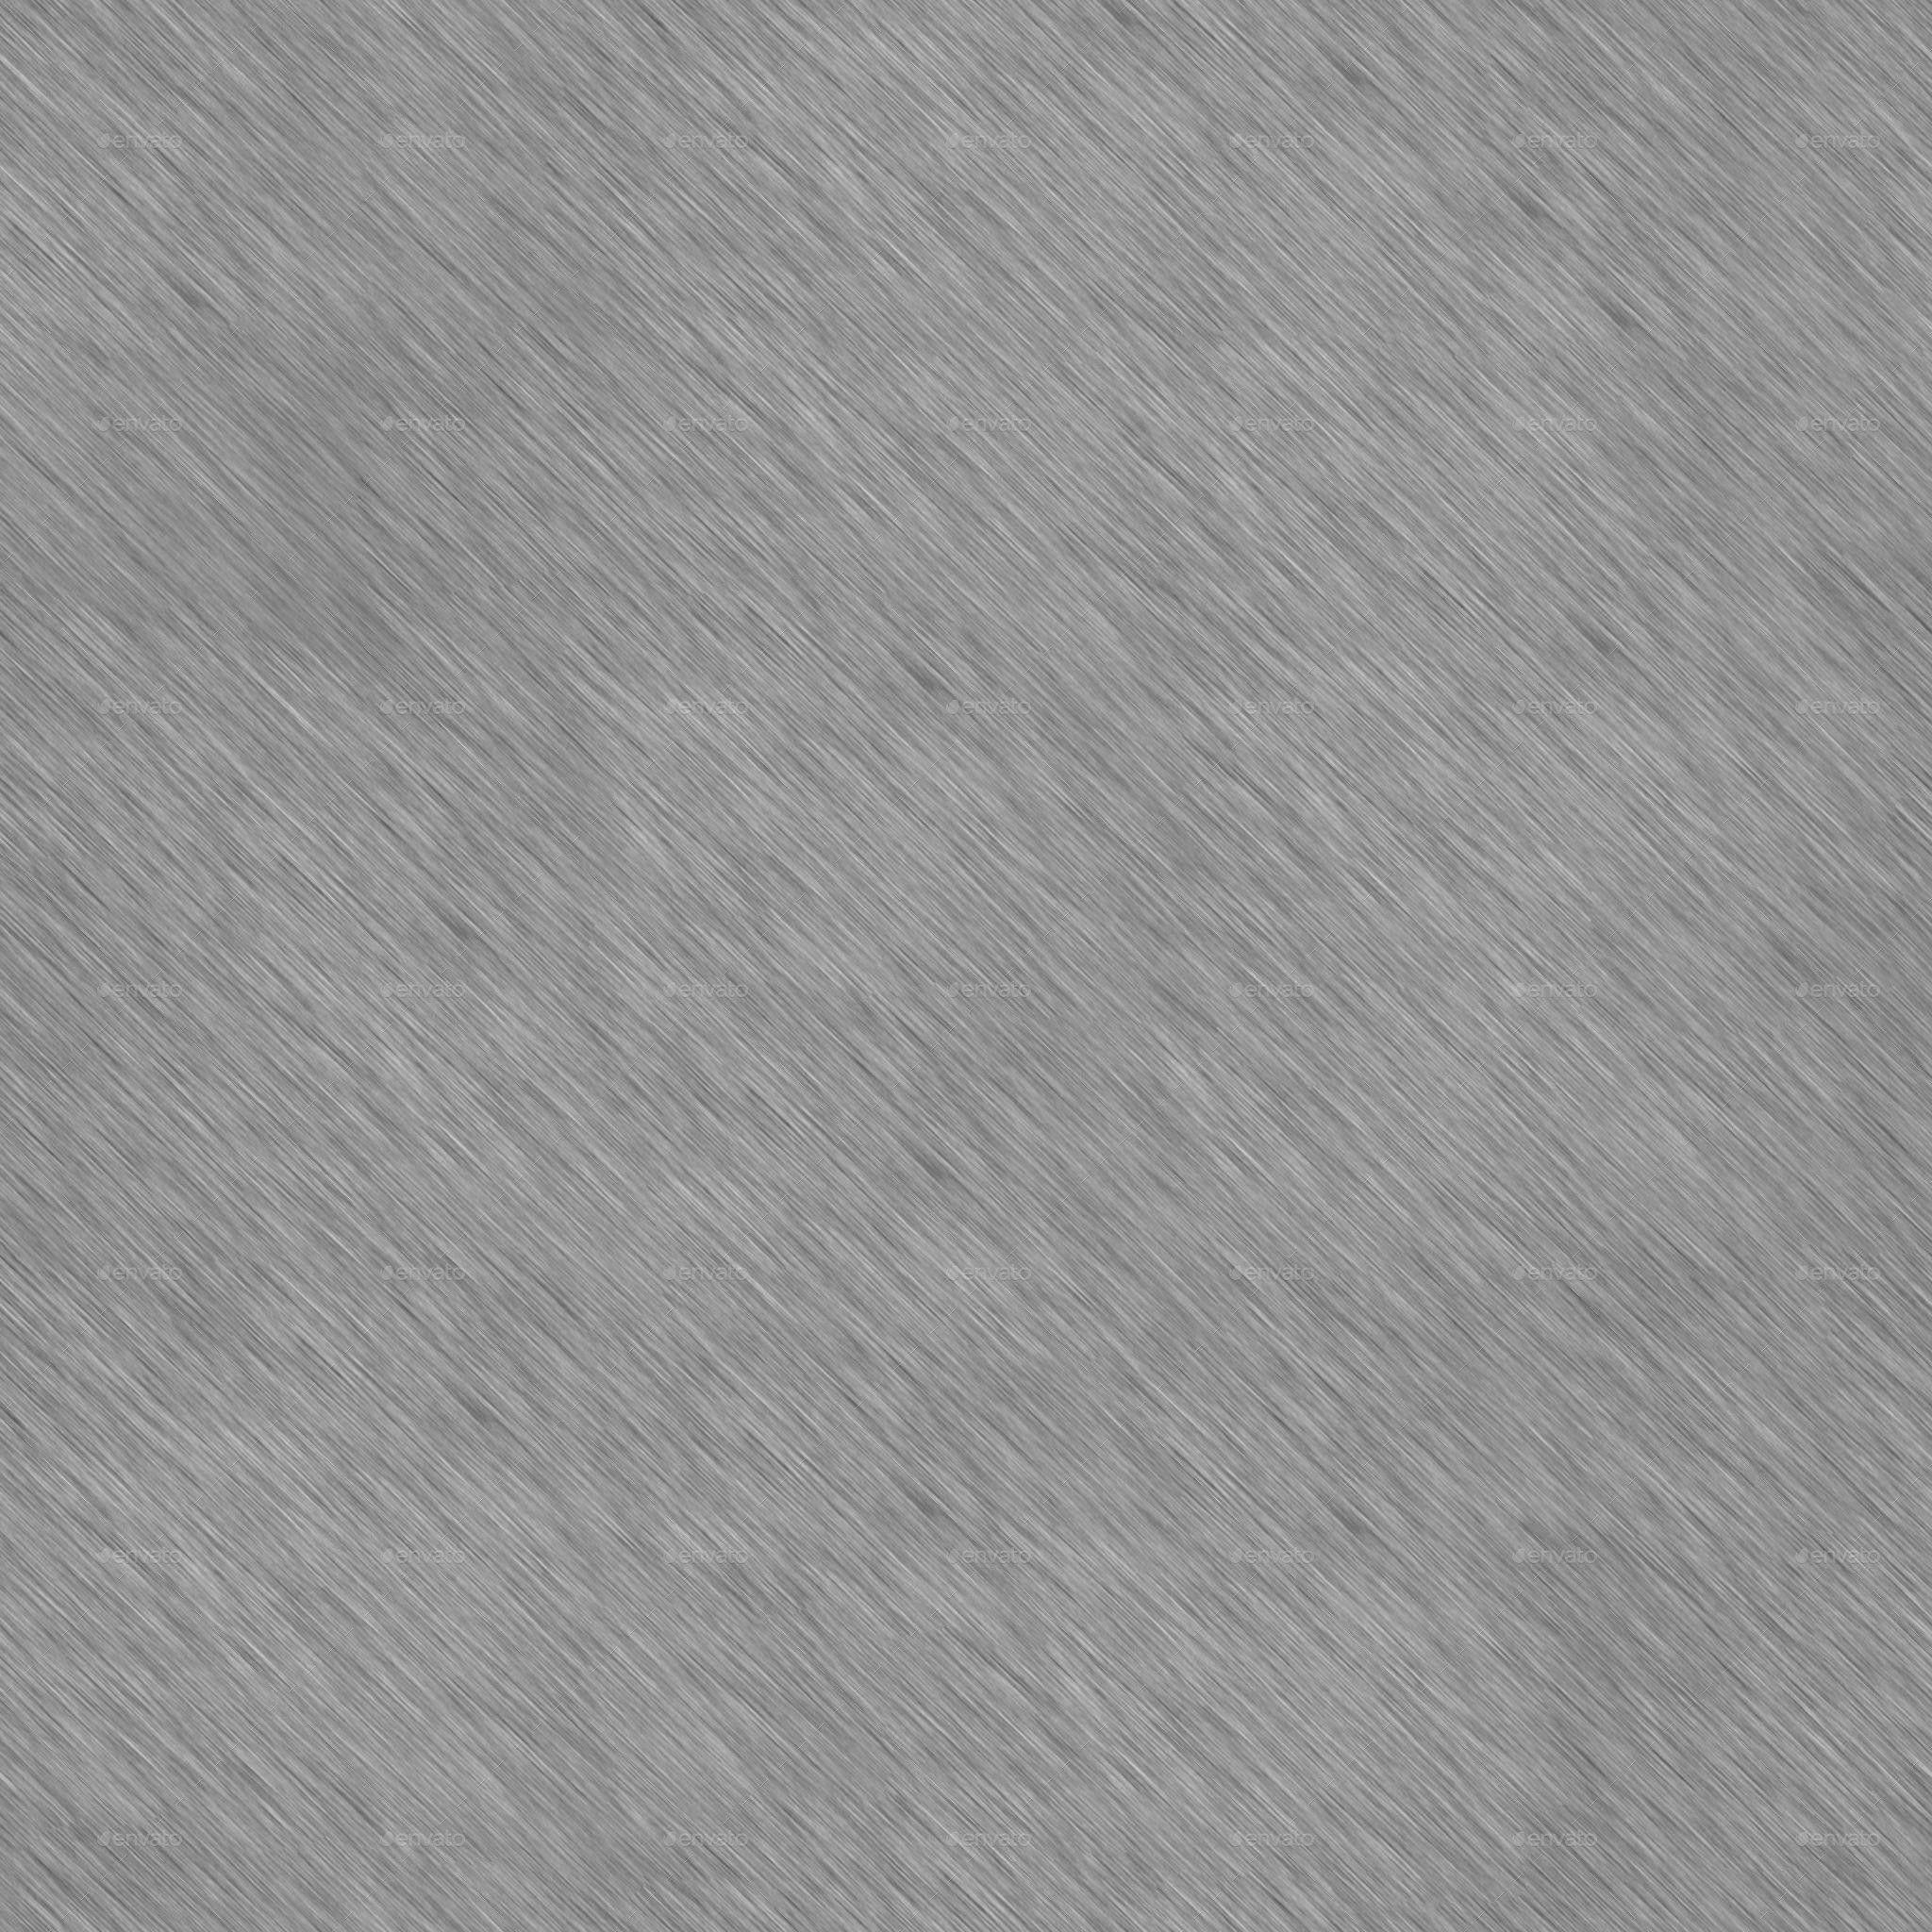 Brushed Metal Seamless Texture Set Volume 1 Seamless Metal